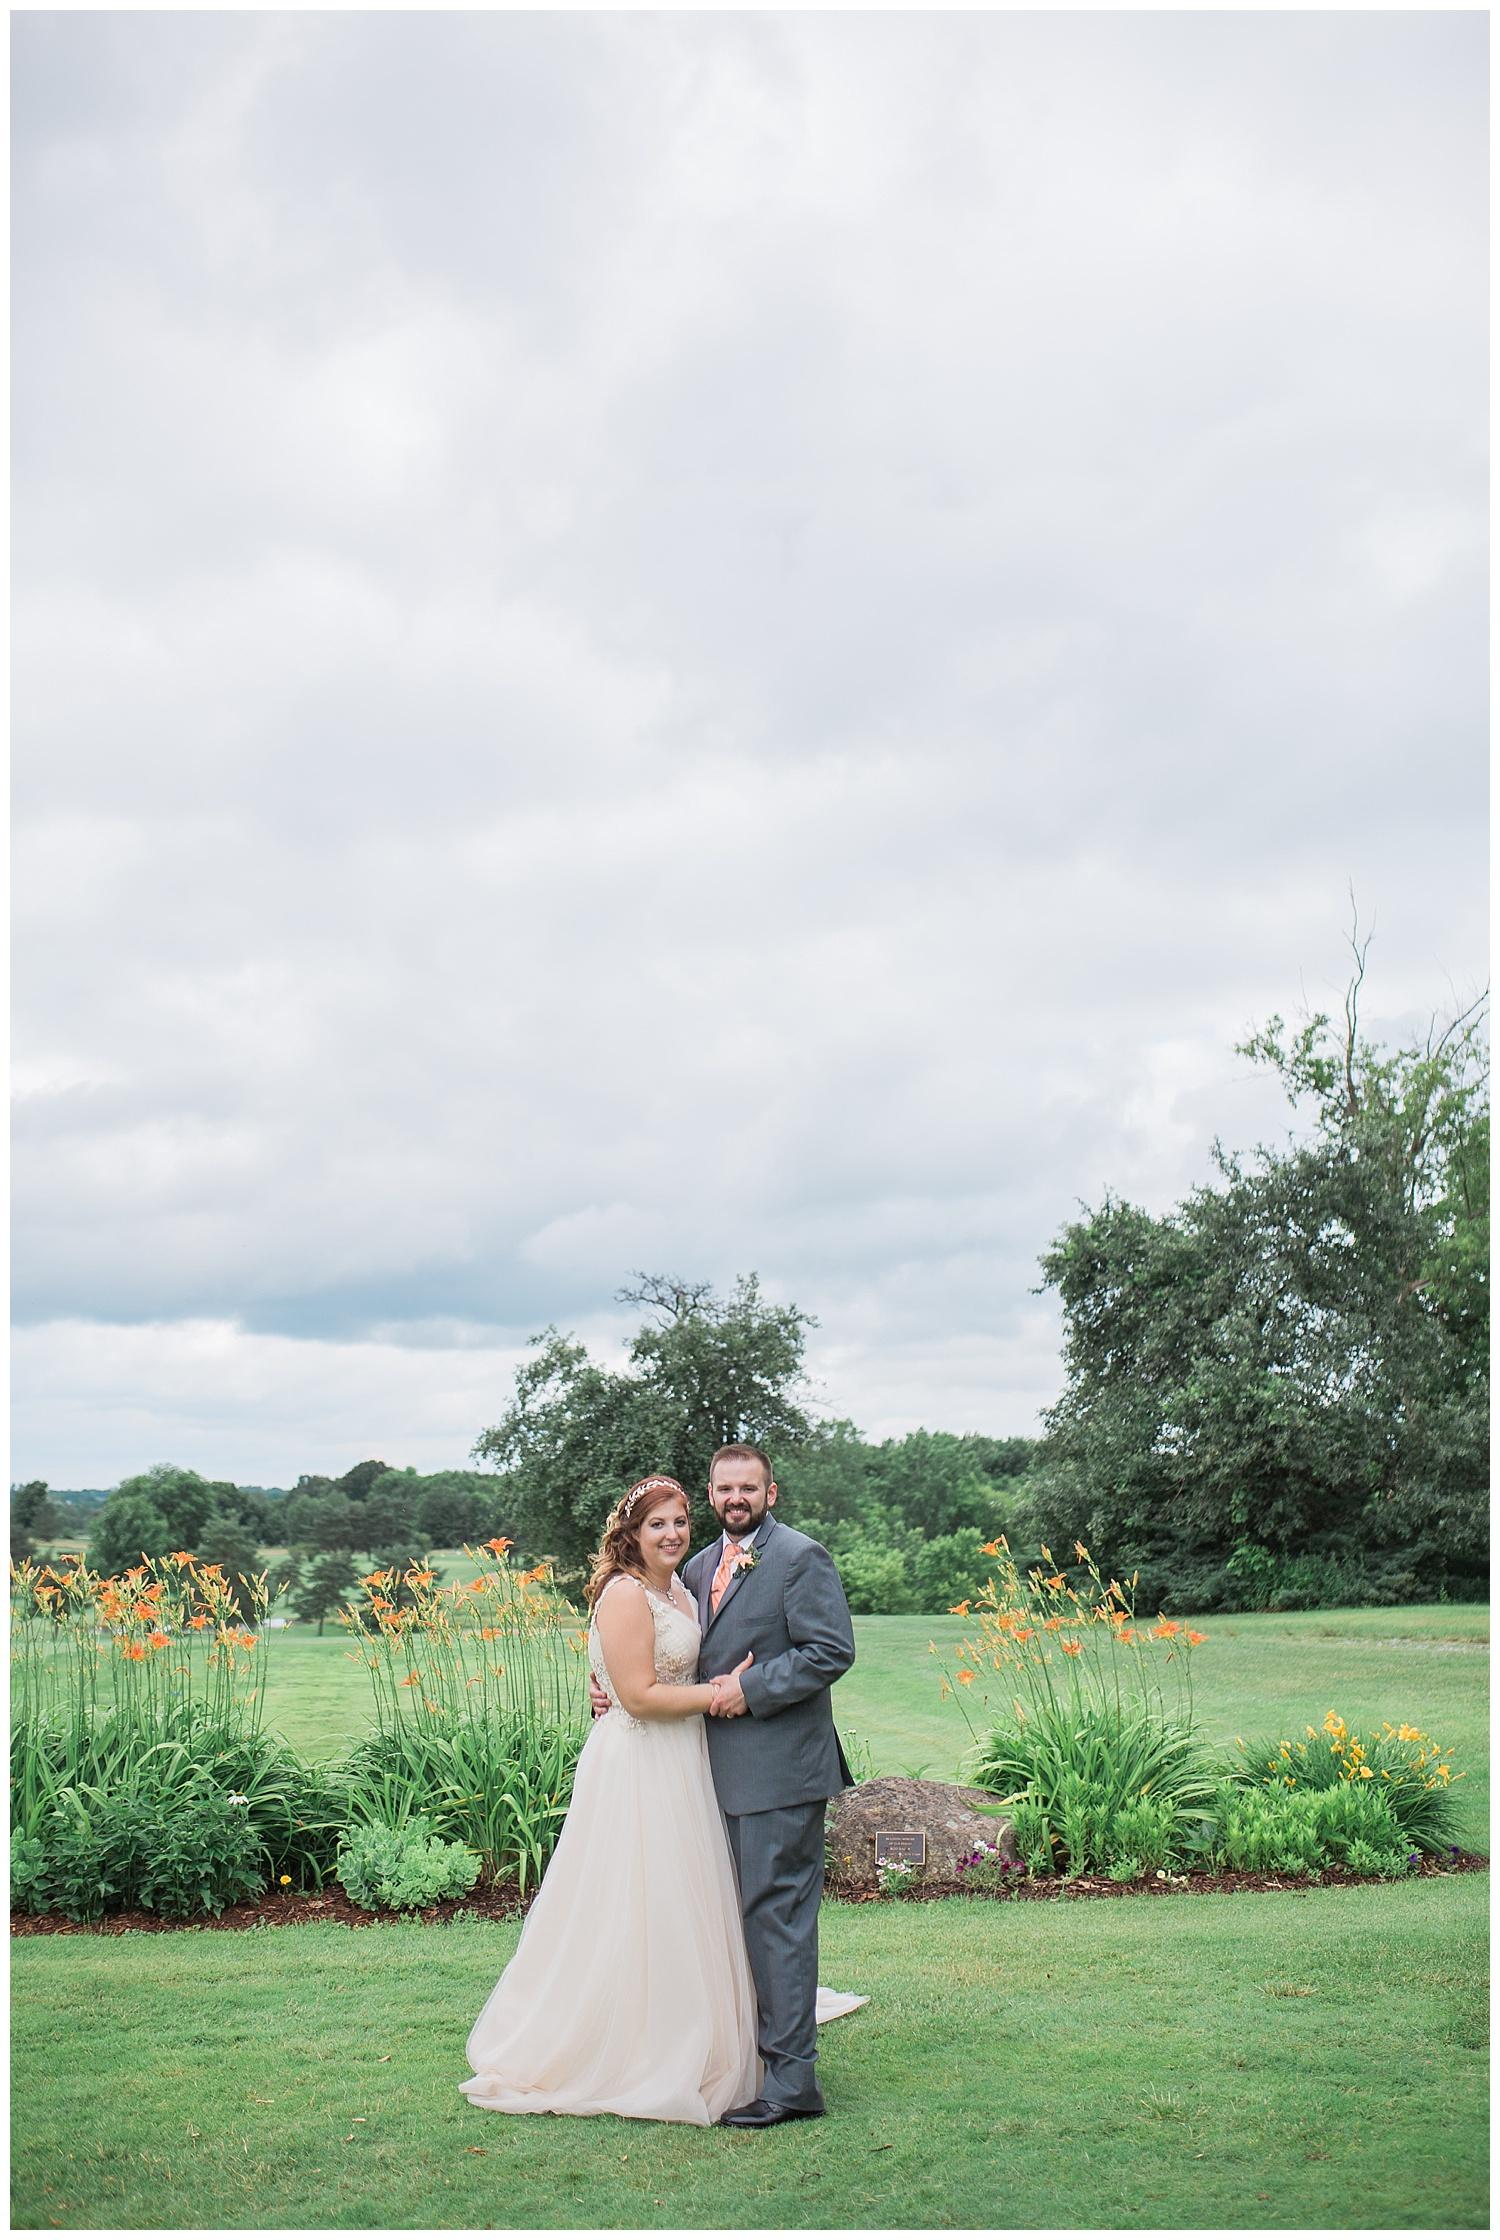 Brian and Molly Wed in Conesus NY - Lass & Beau-776_Buffalo wedding photography.jpg